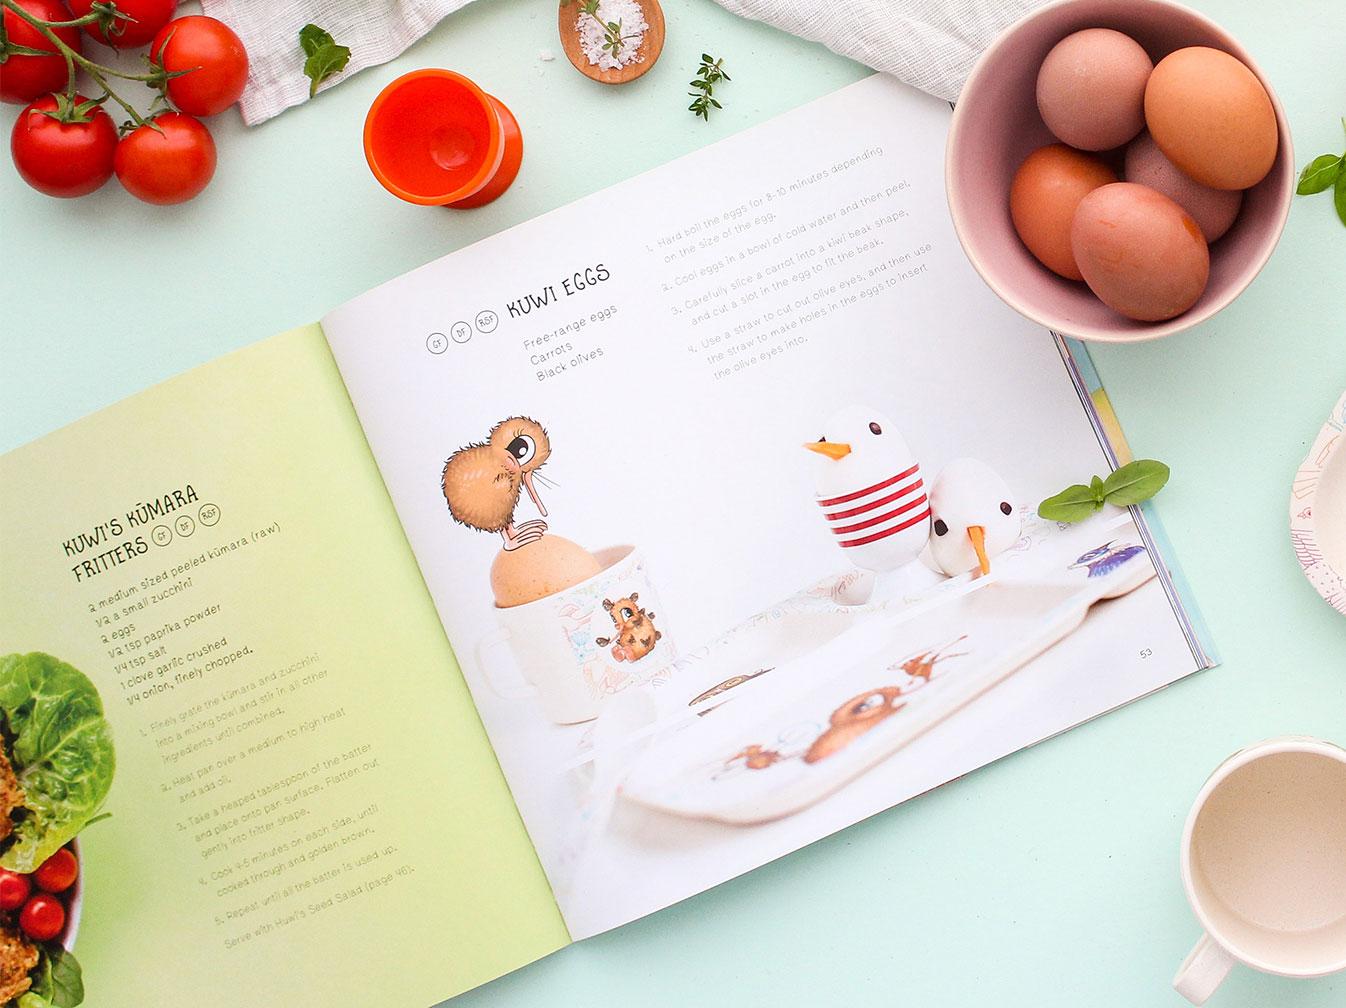 Kuwi the Kiwi Kitchen Kids' Cookbook Design Publication